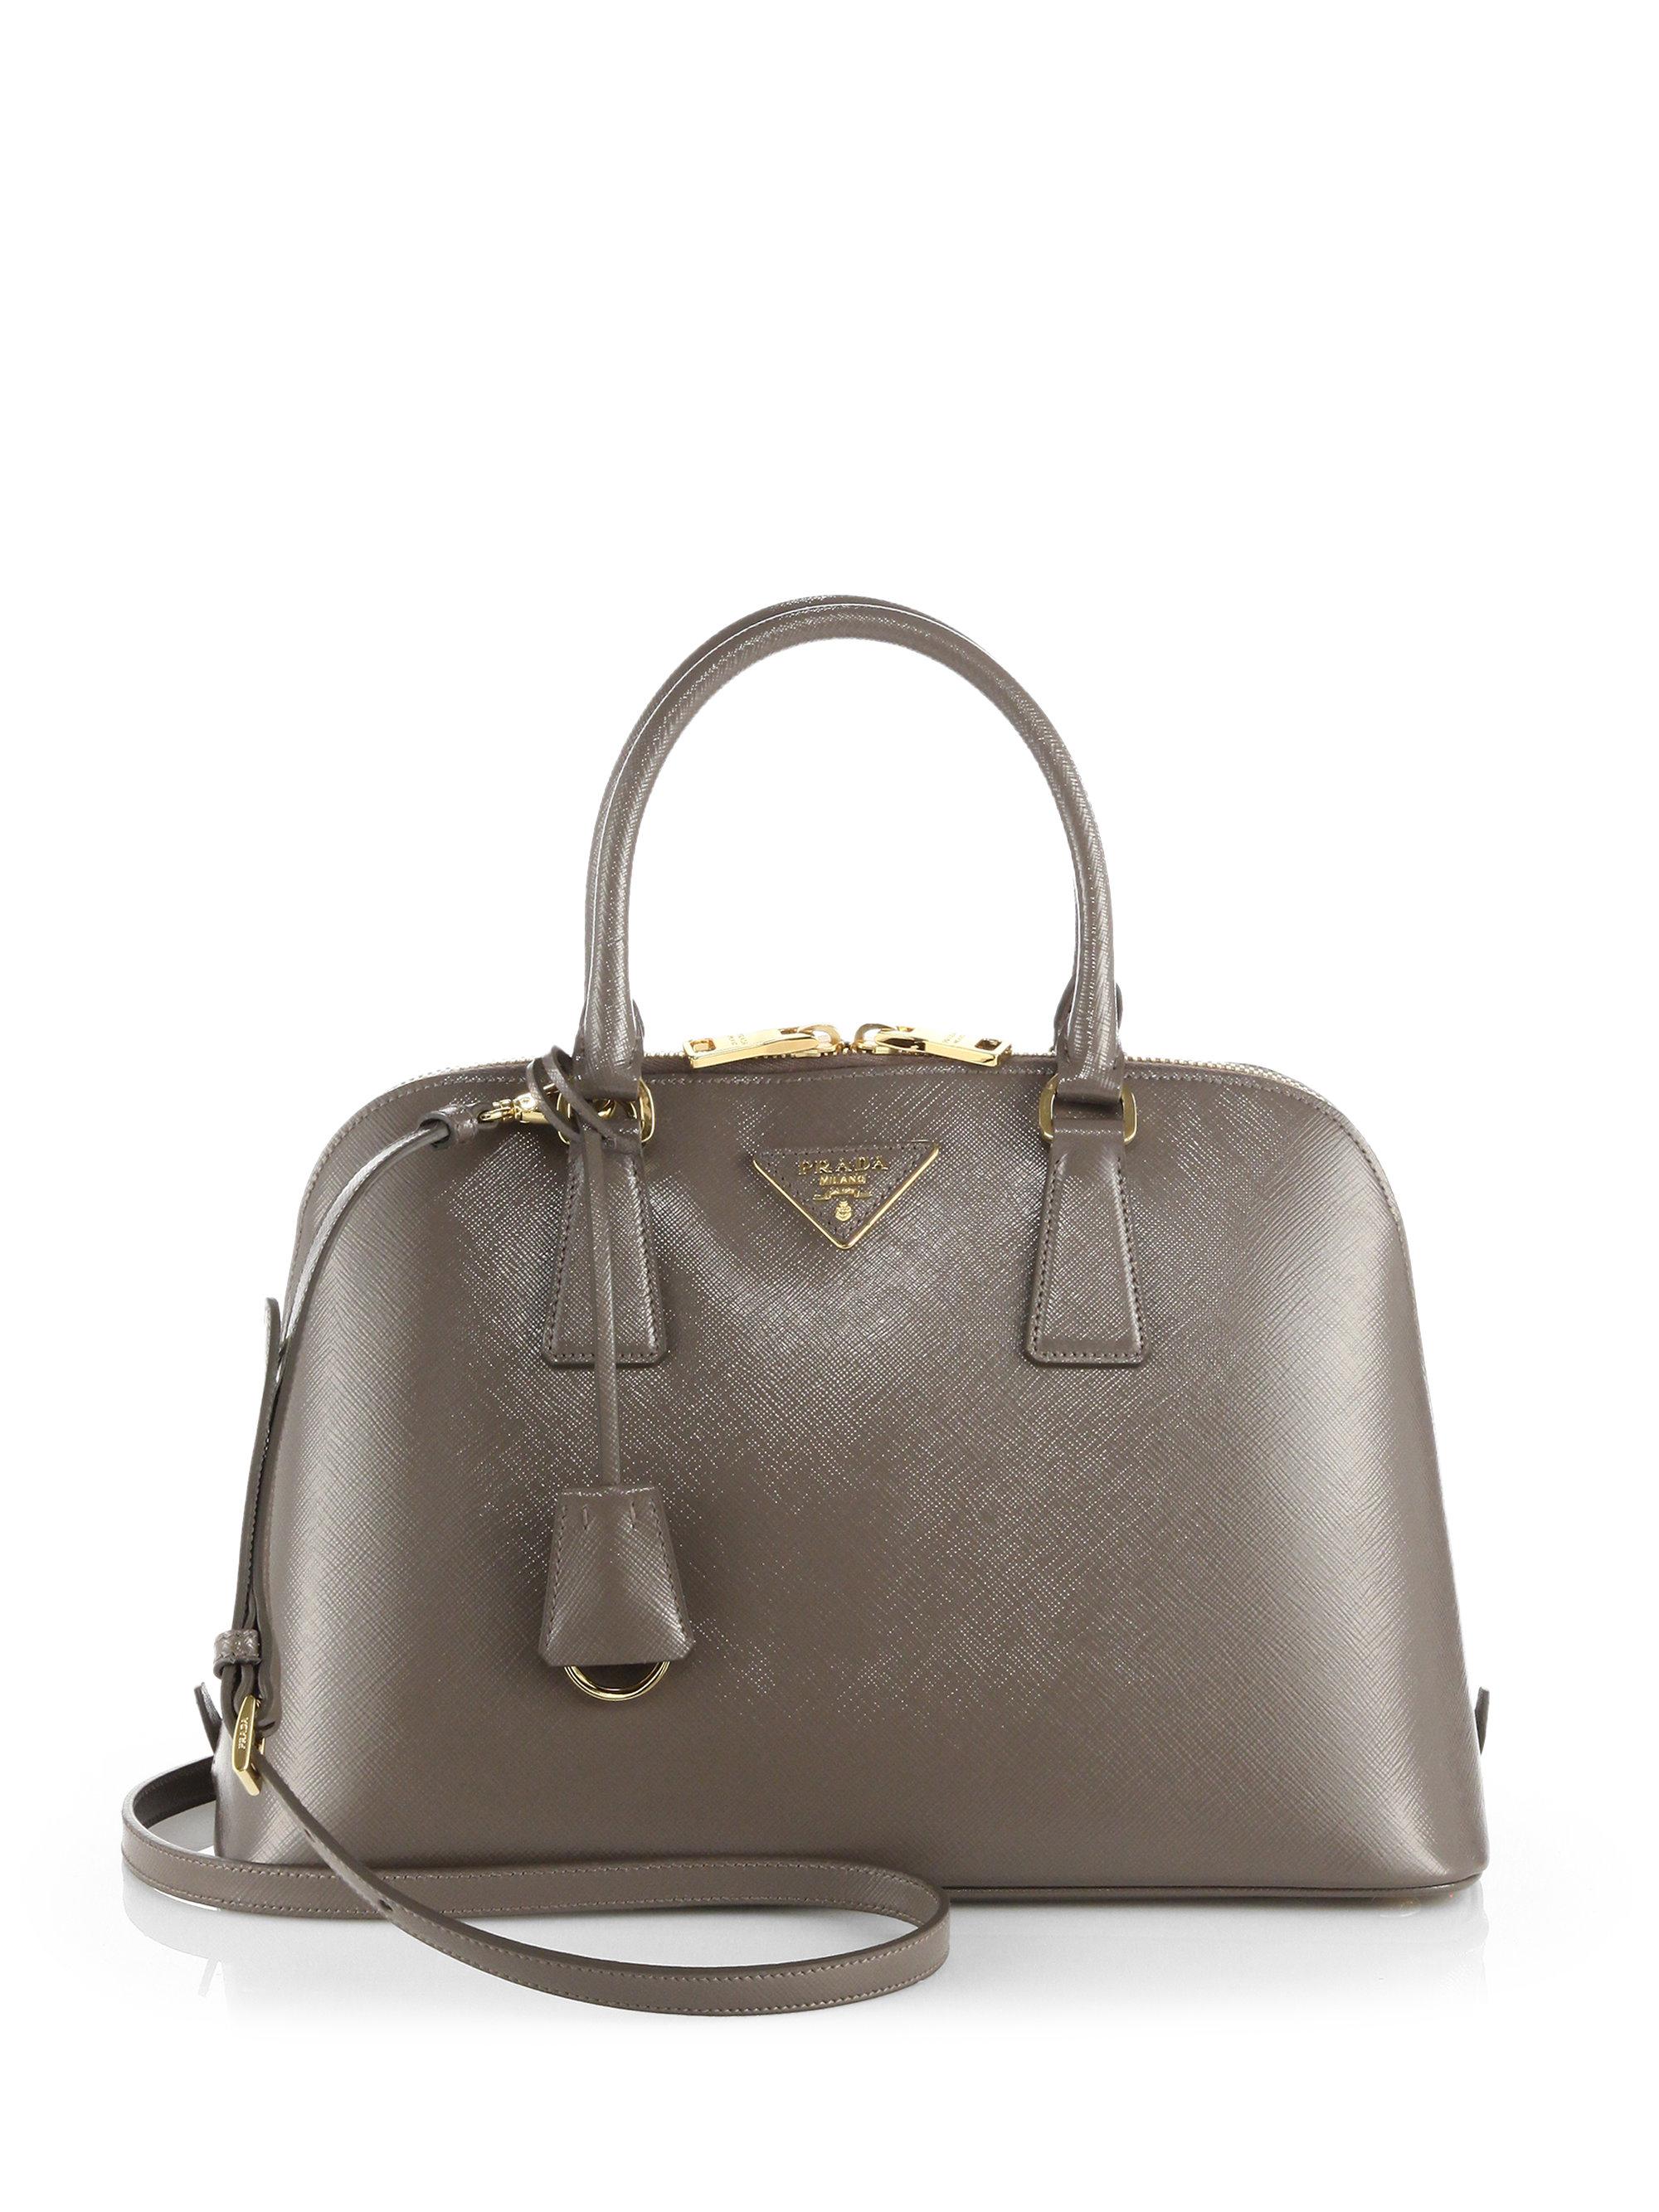 377681d28eaf ... low price lyst prada saffiano bicolor dome bag in gray 75e06 40829